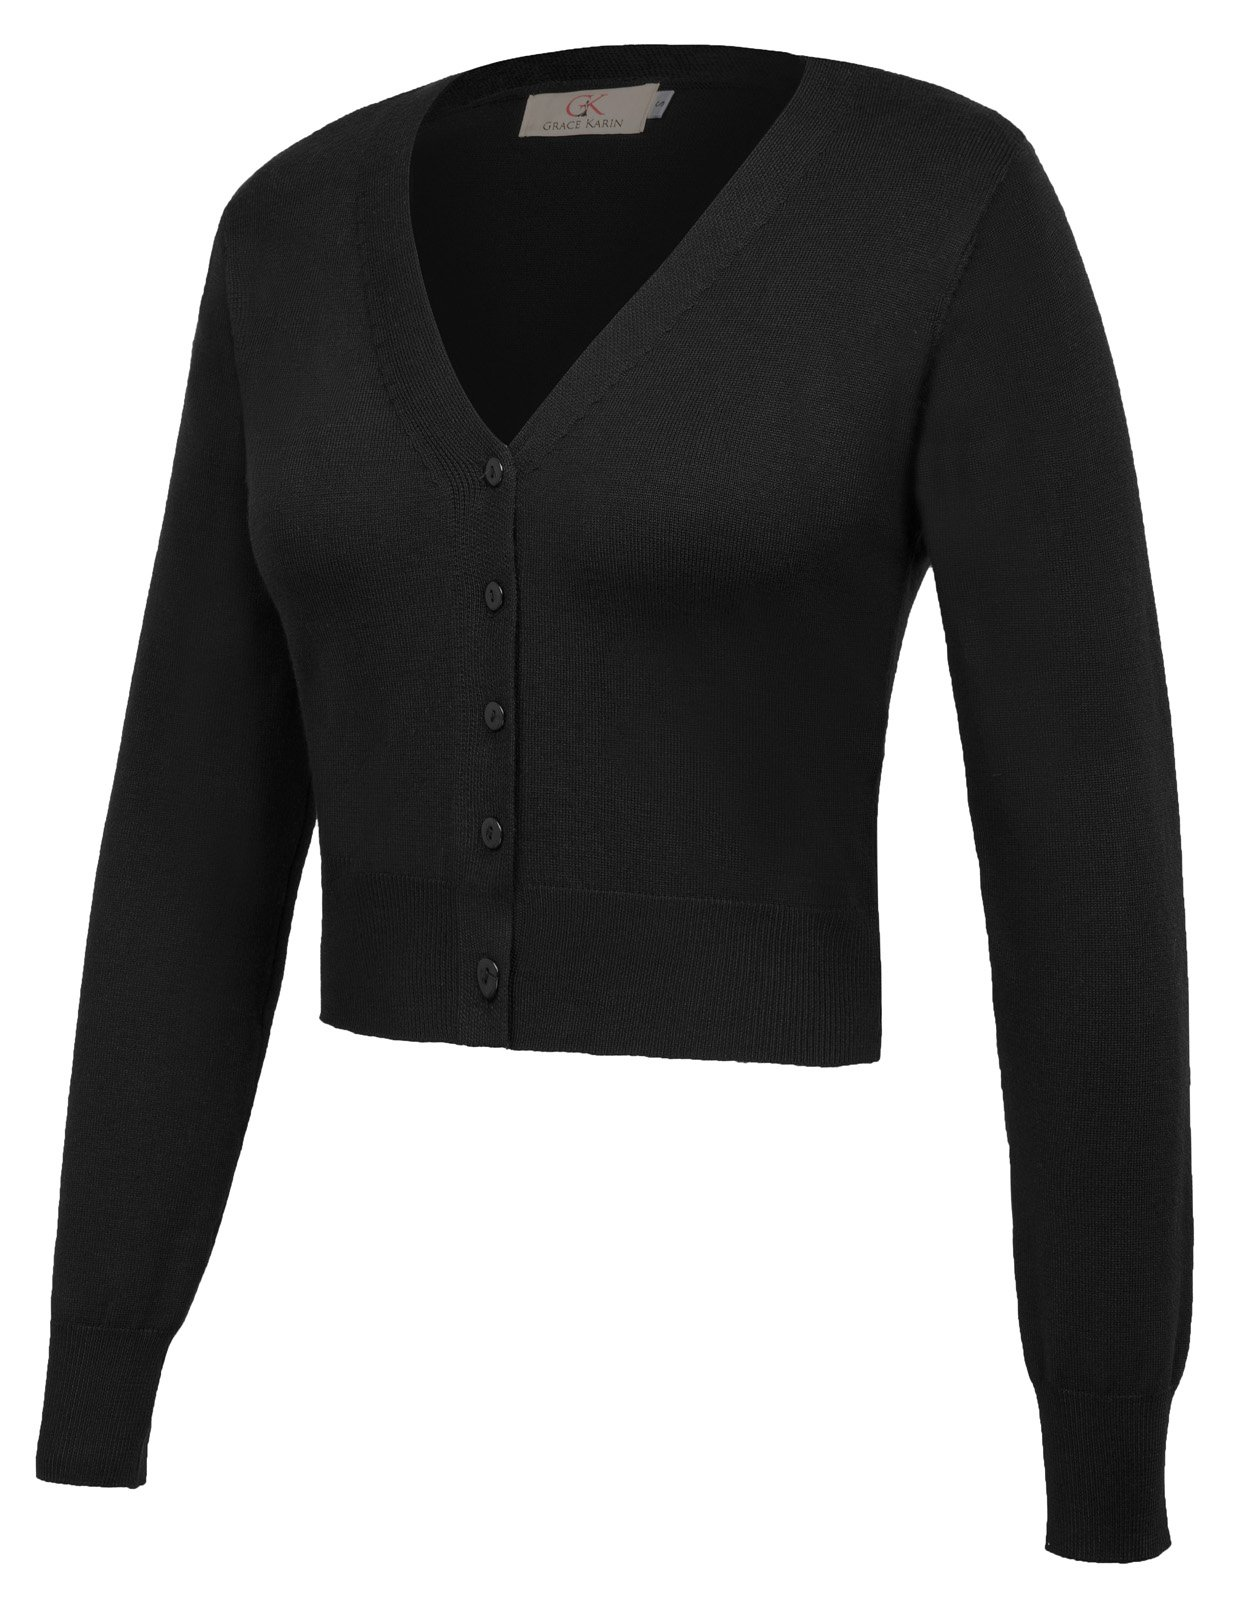 GRACE KARIN Women Cropped Short Chiffon Bolero Shrug Black Size S CL2000-1